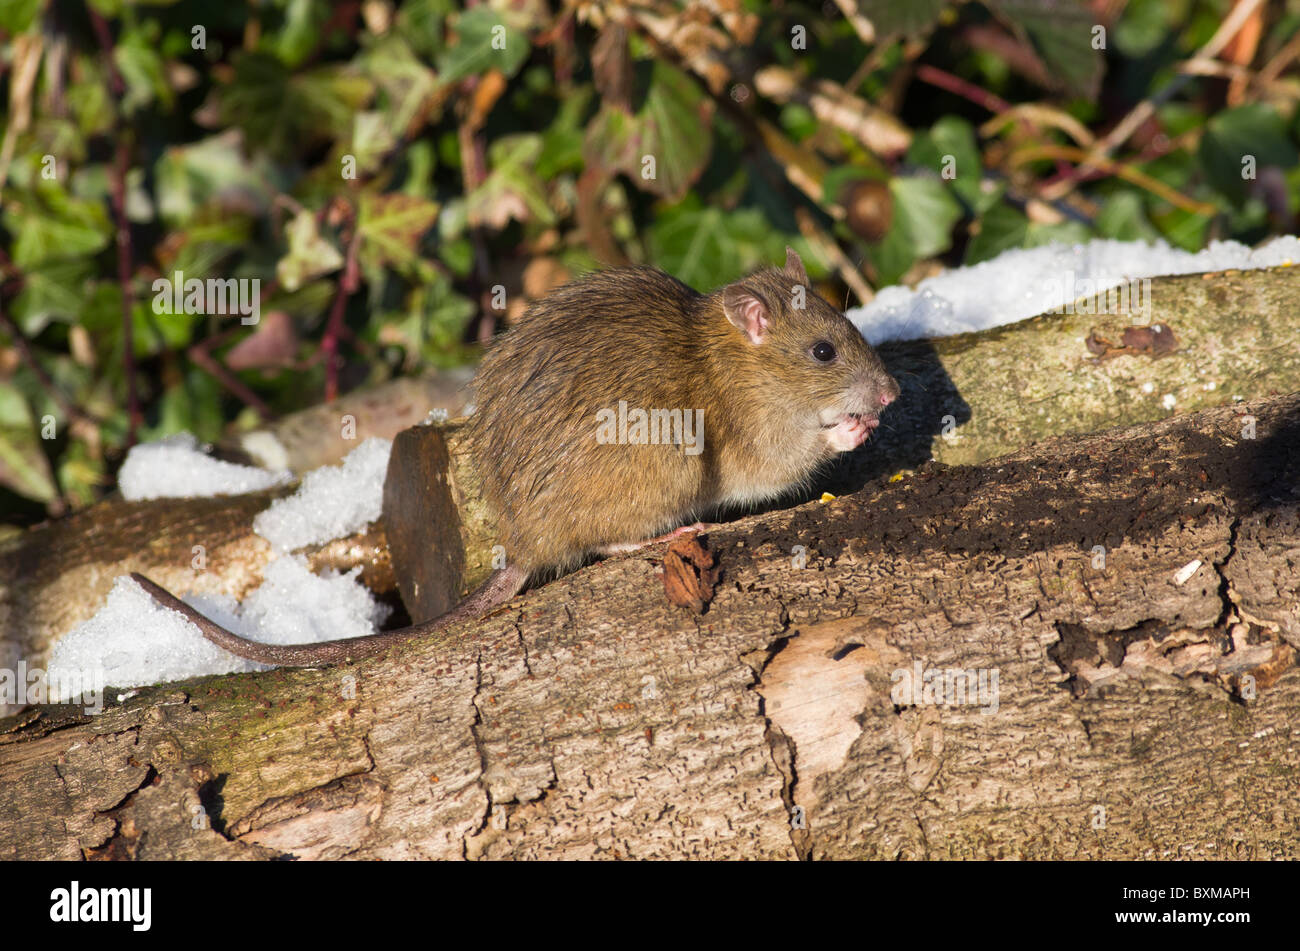 Brown Rat (Rattus norvegicus) - Stock Image